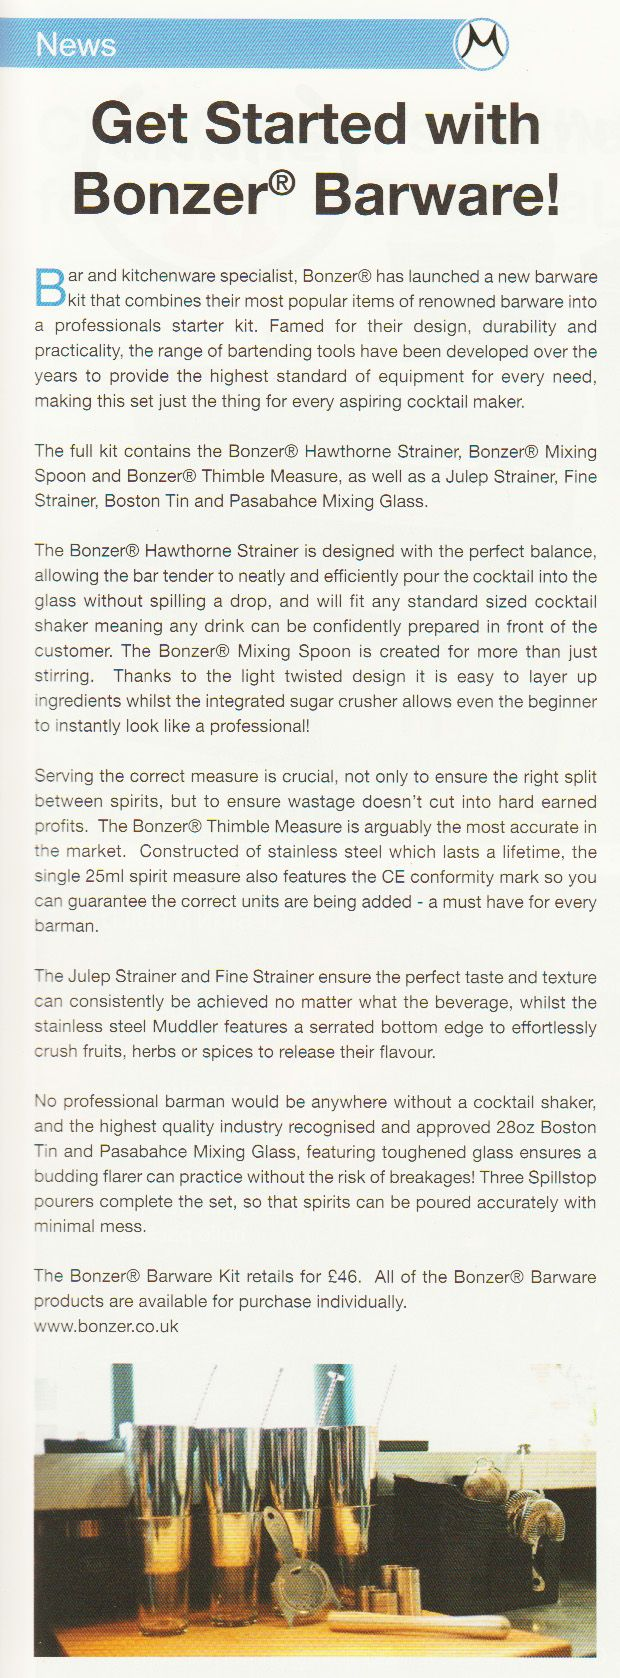 Get started with Bonzer Barware! (Masala Magazine, July-Sept 2013)